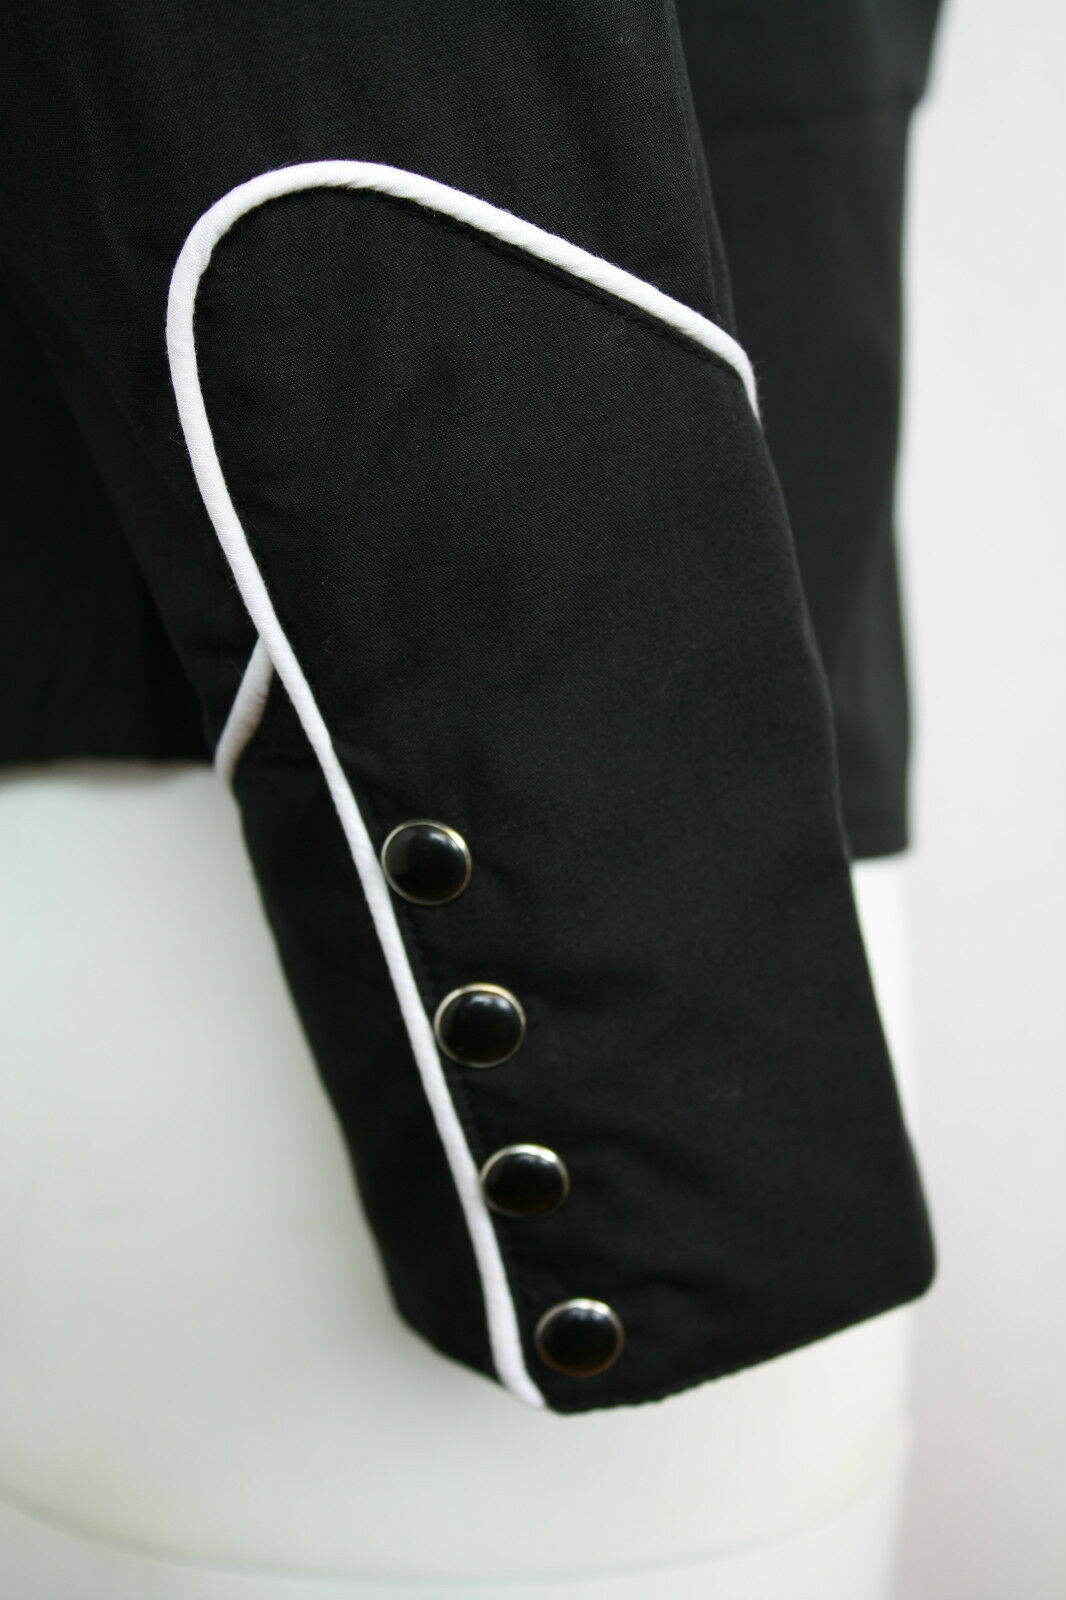 Relco Tinta Unita Nera Western Western Western Cowboy a Profilo Bianco Camicia a Maniche Lunghe 656920